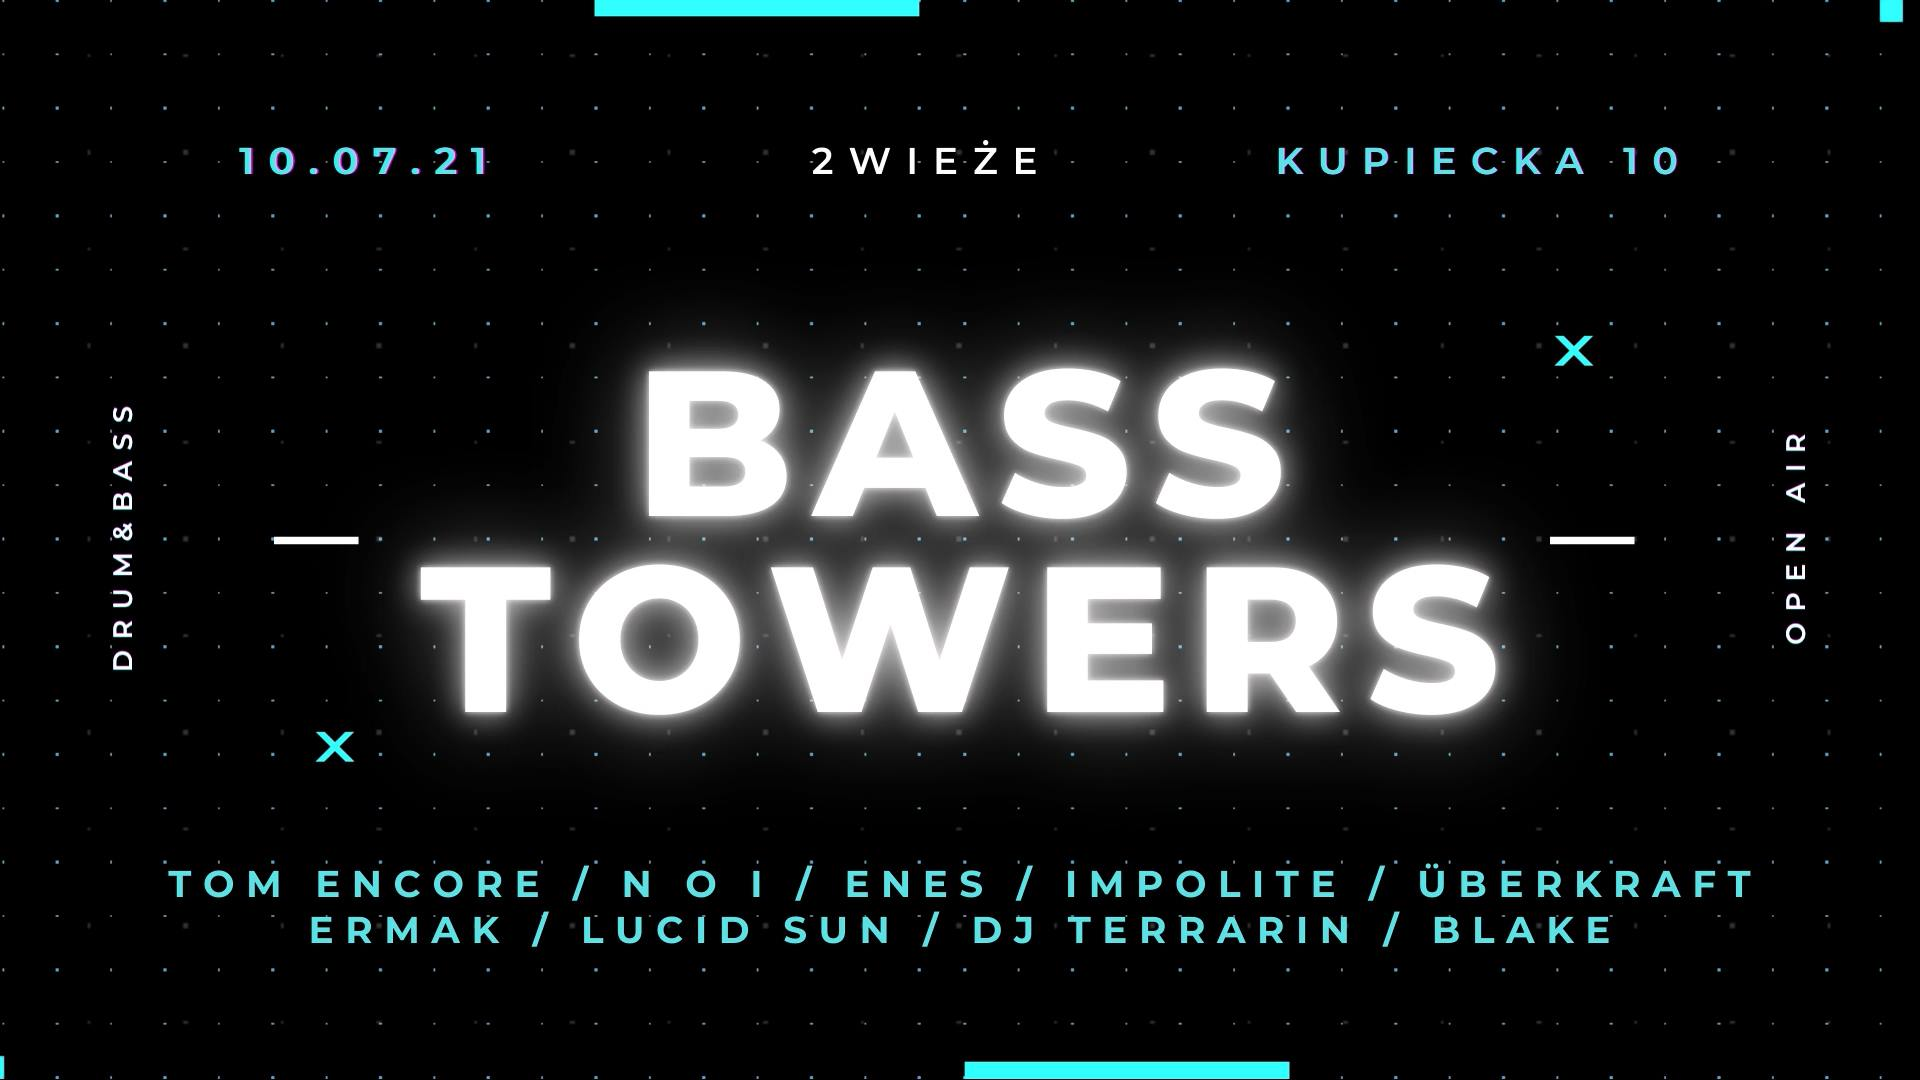 bass tower warszawa waraw drumnandbass dnb